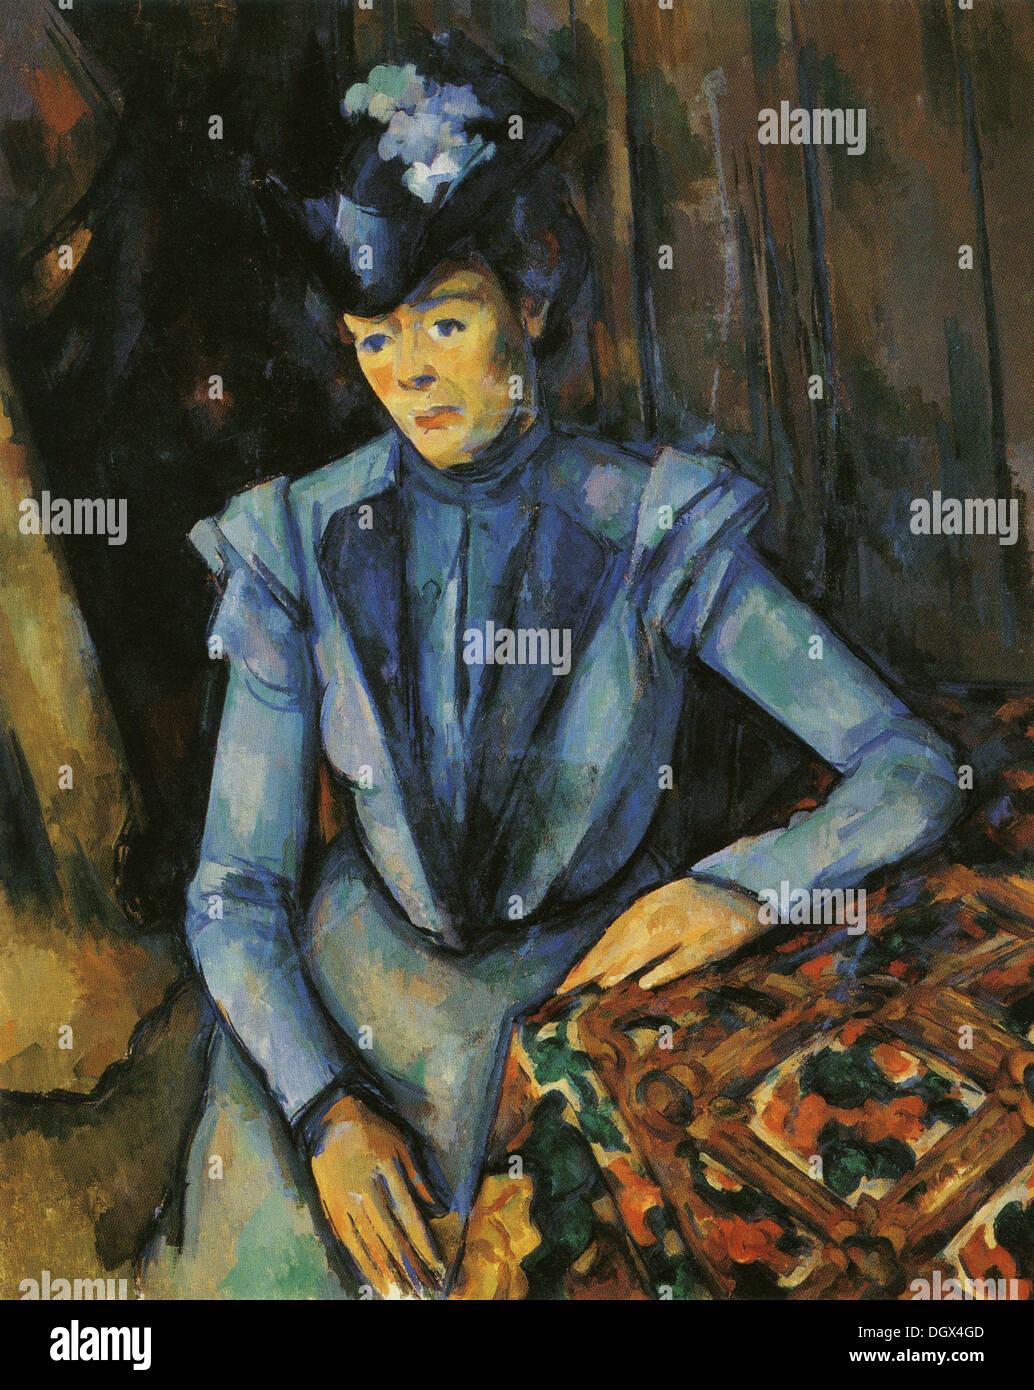 Lady en Azul - por Paul Cézanne, 1900 Imagen De Stock